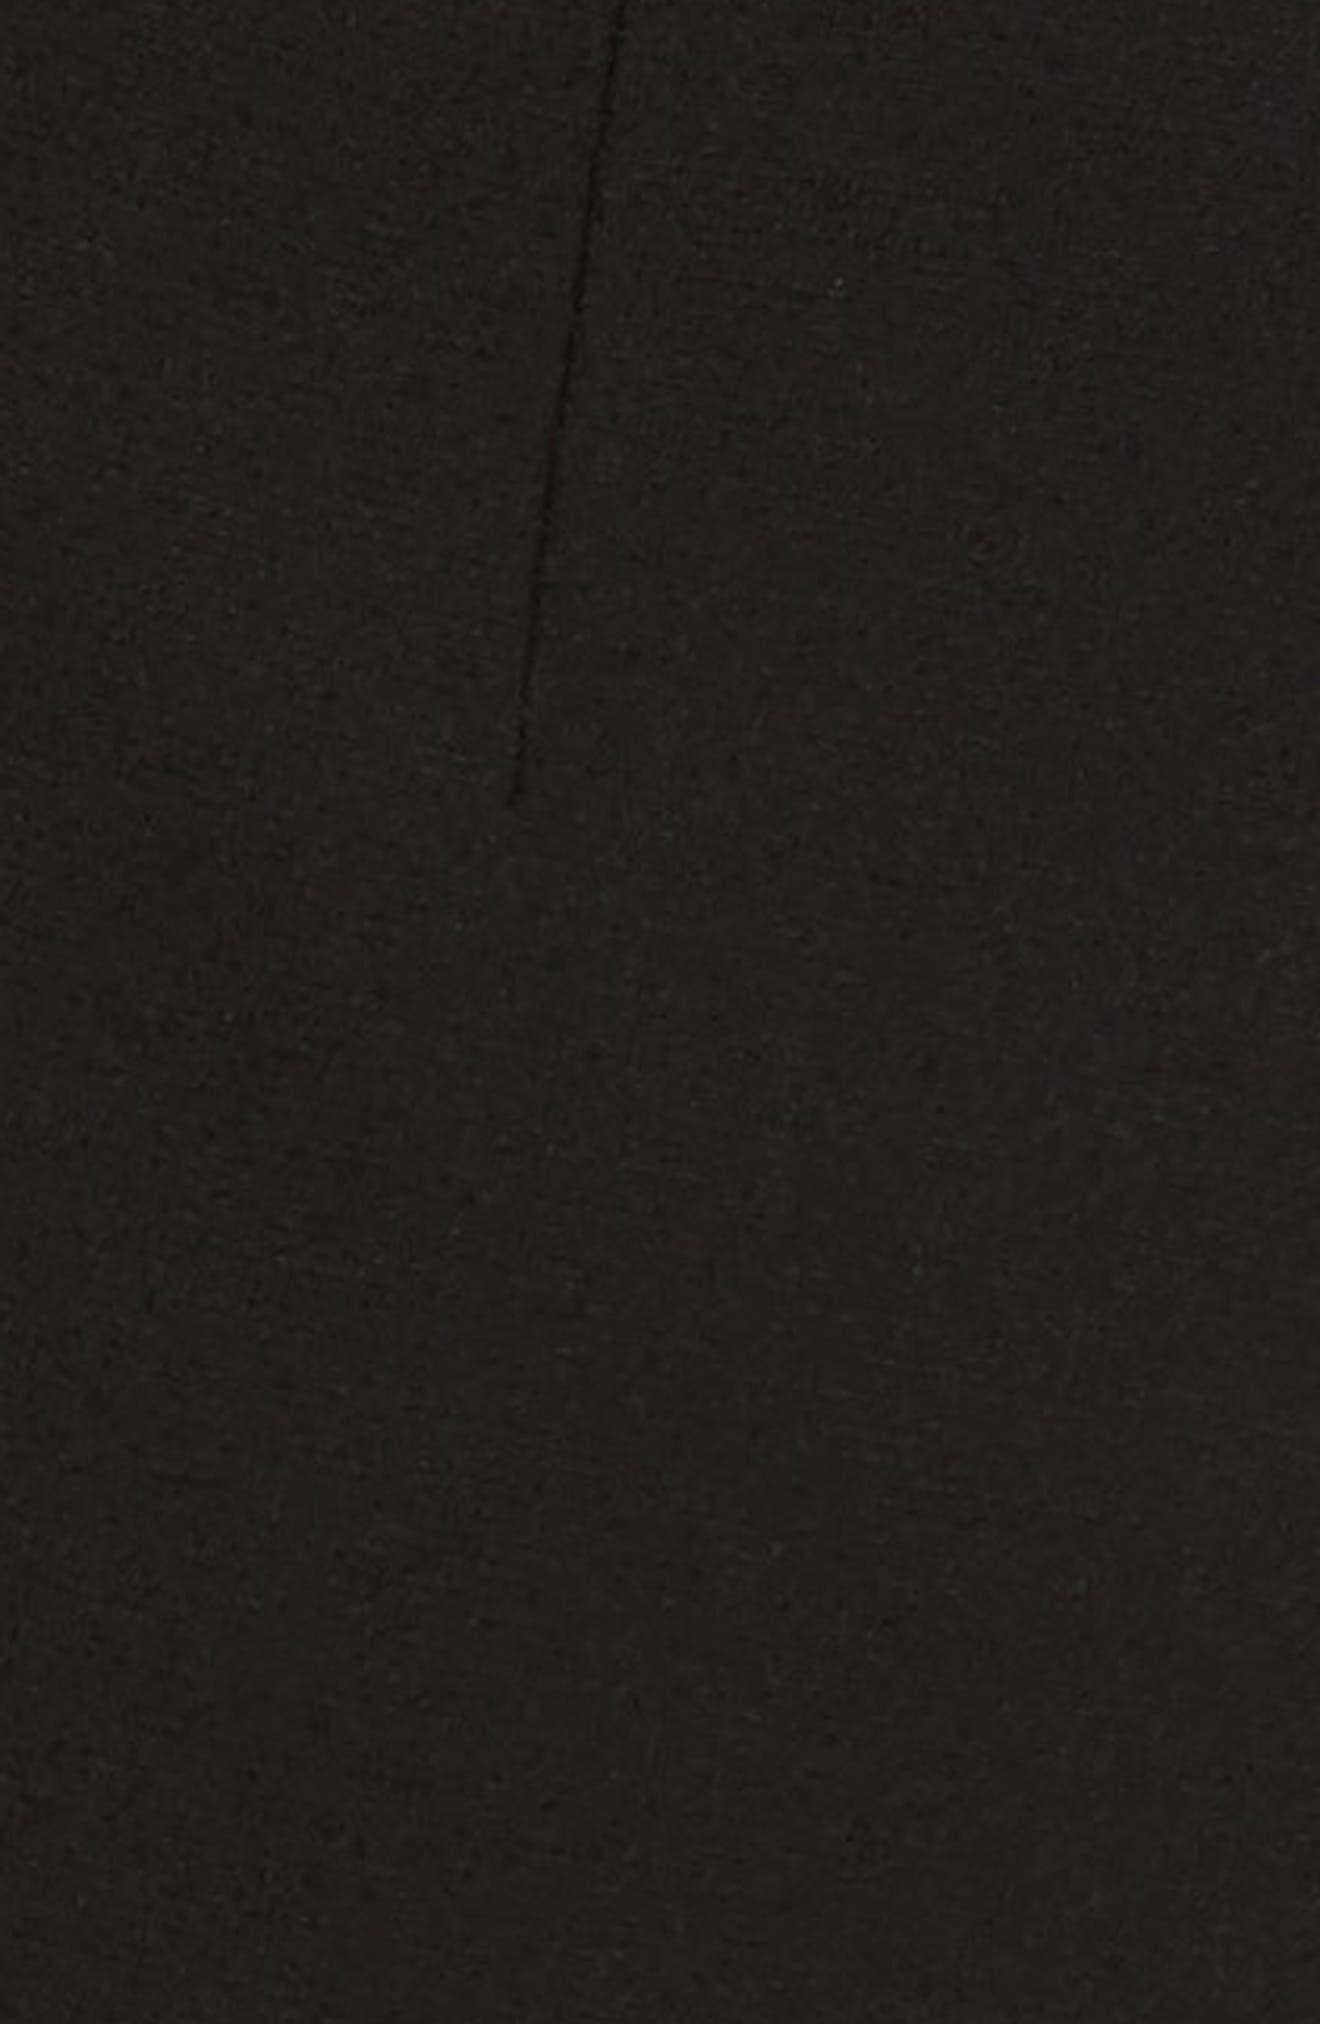 Manhattan Finesse Crepe Crop Flare Pants,                             Alternate thumbnail 6, color,                             BLACK